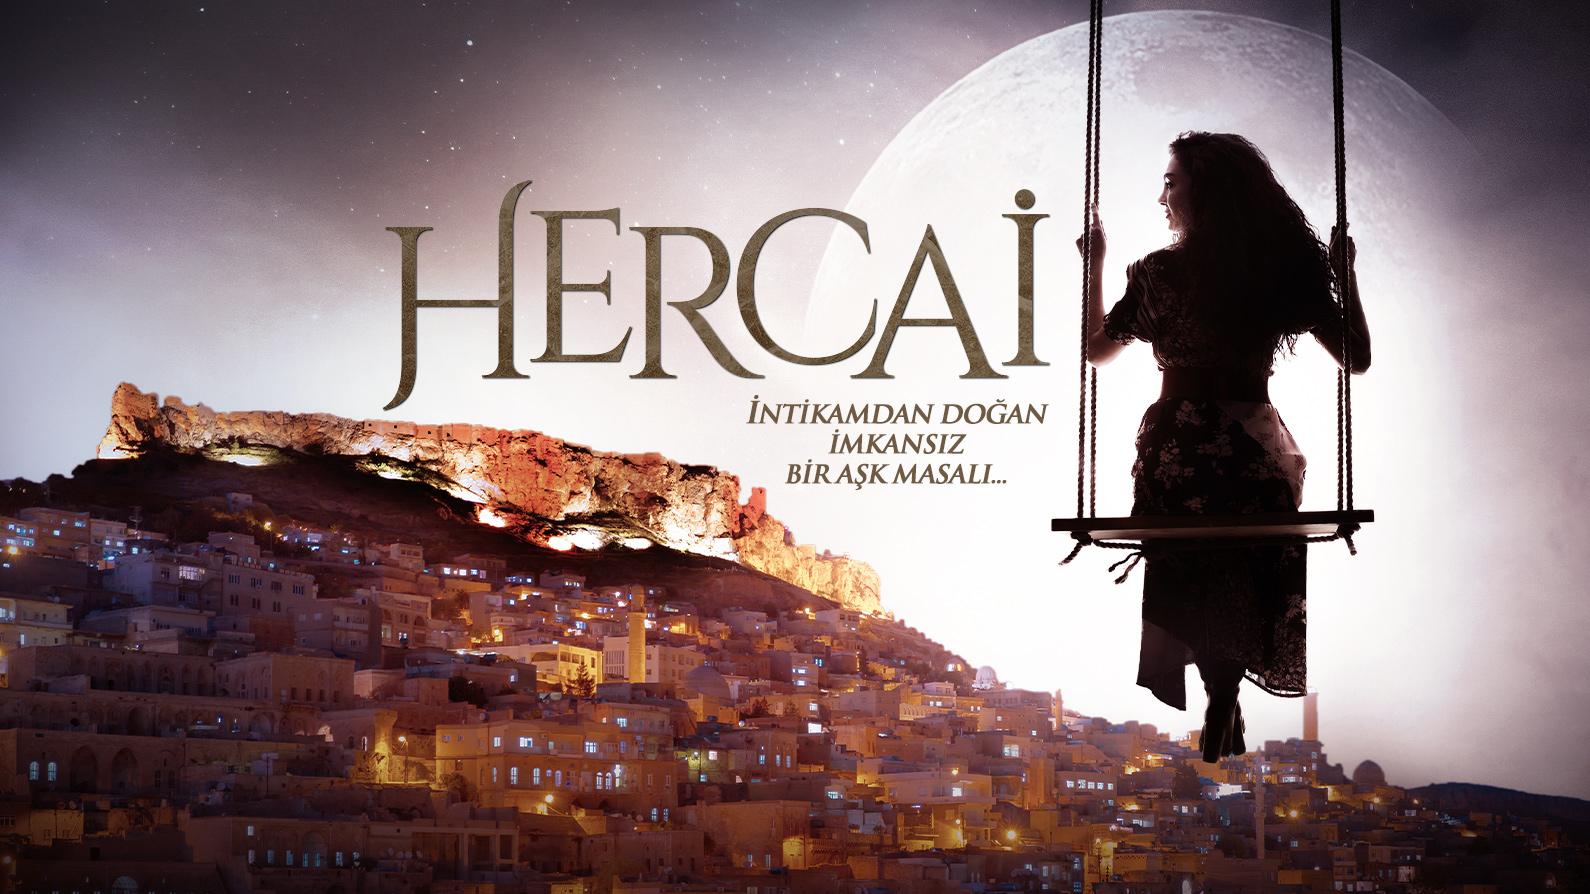 hercai_slider_3